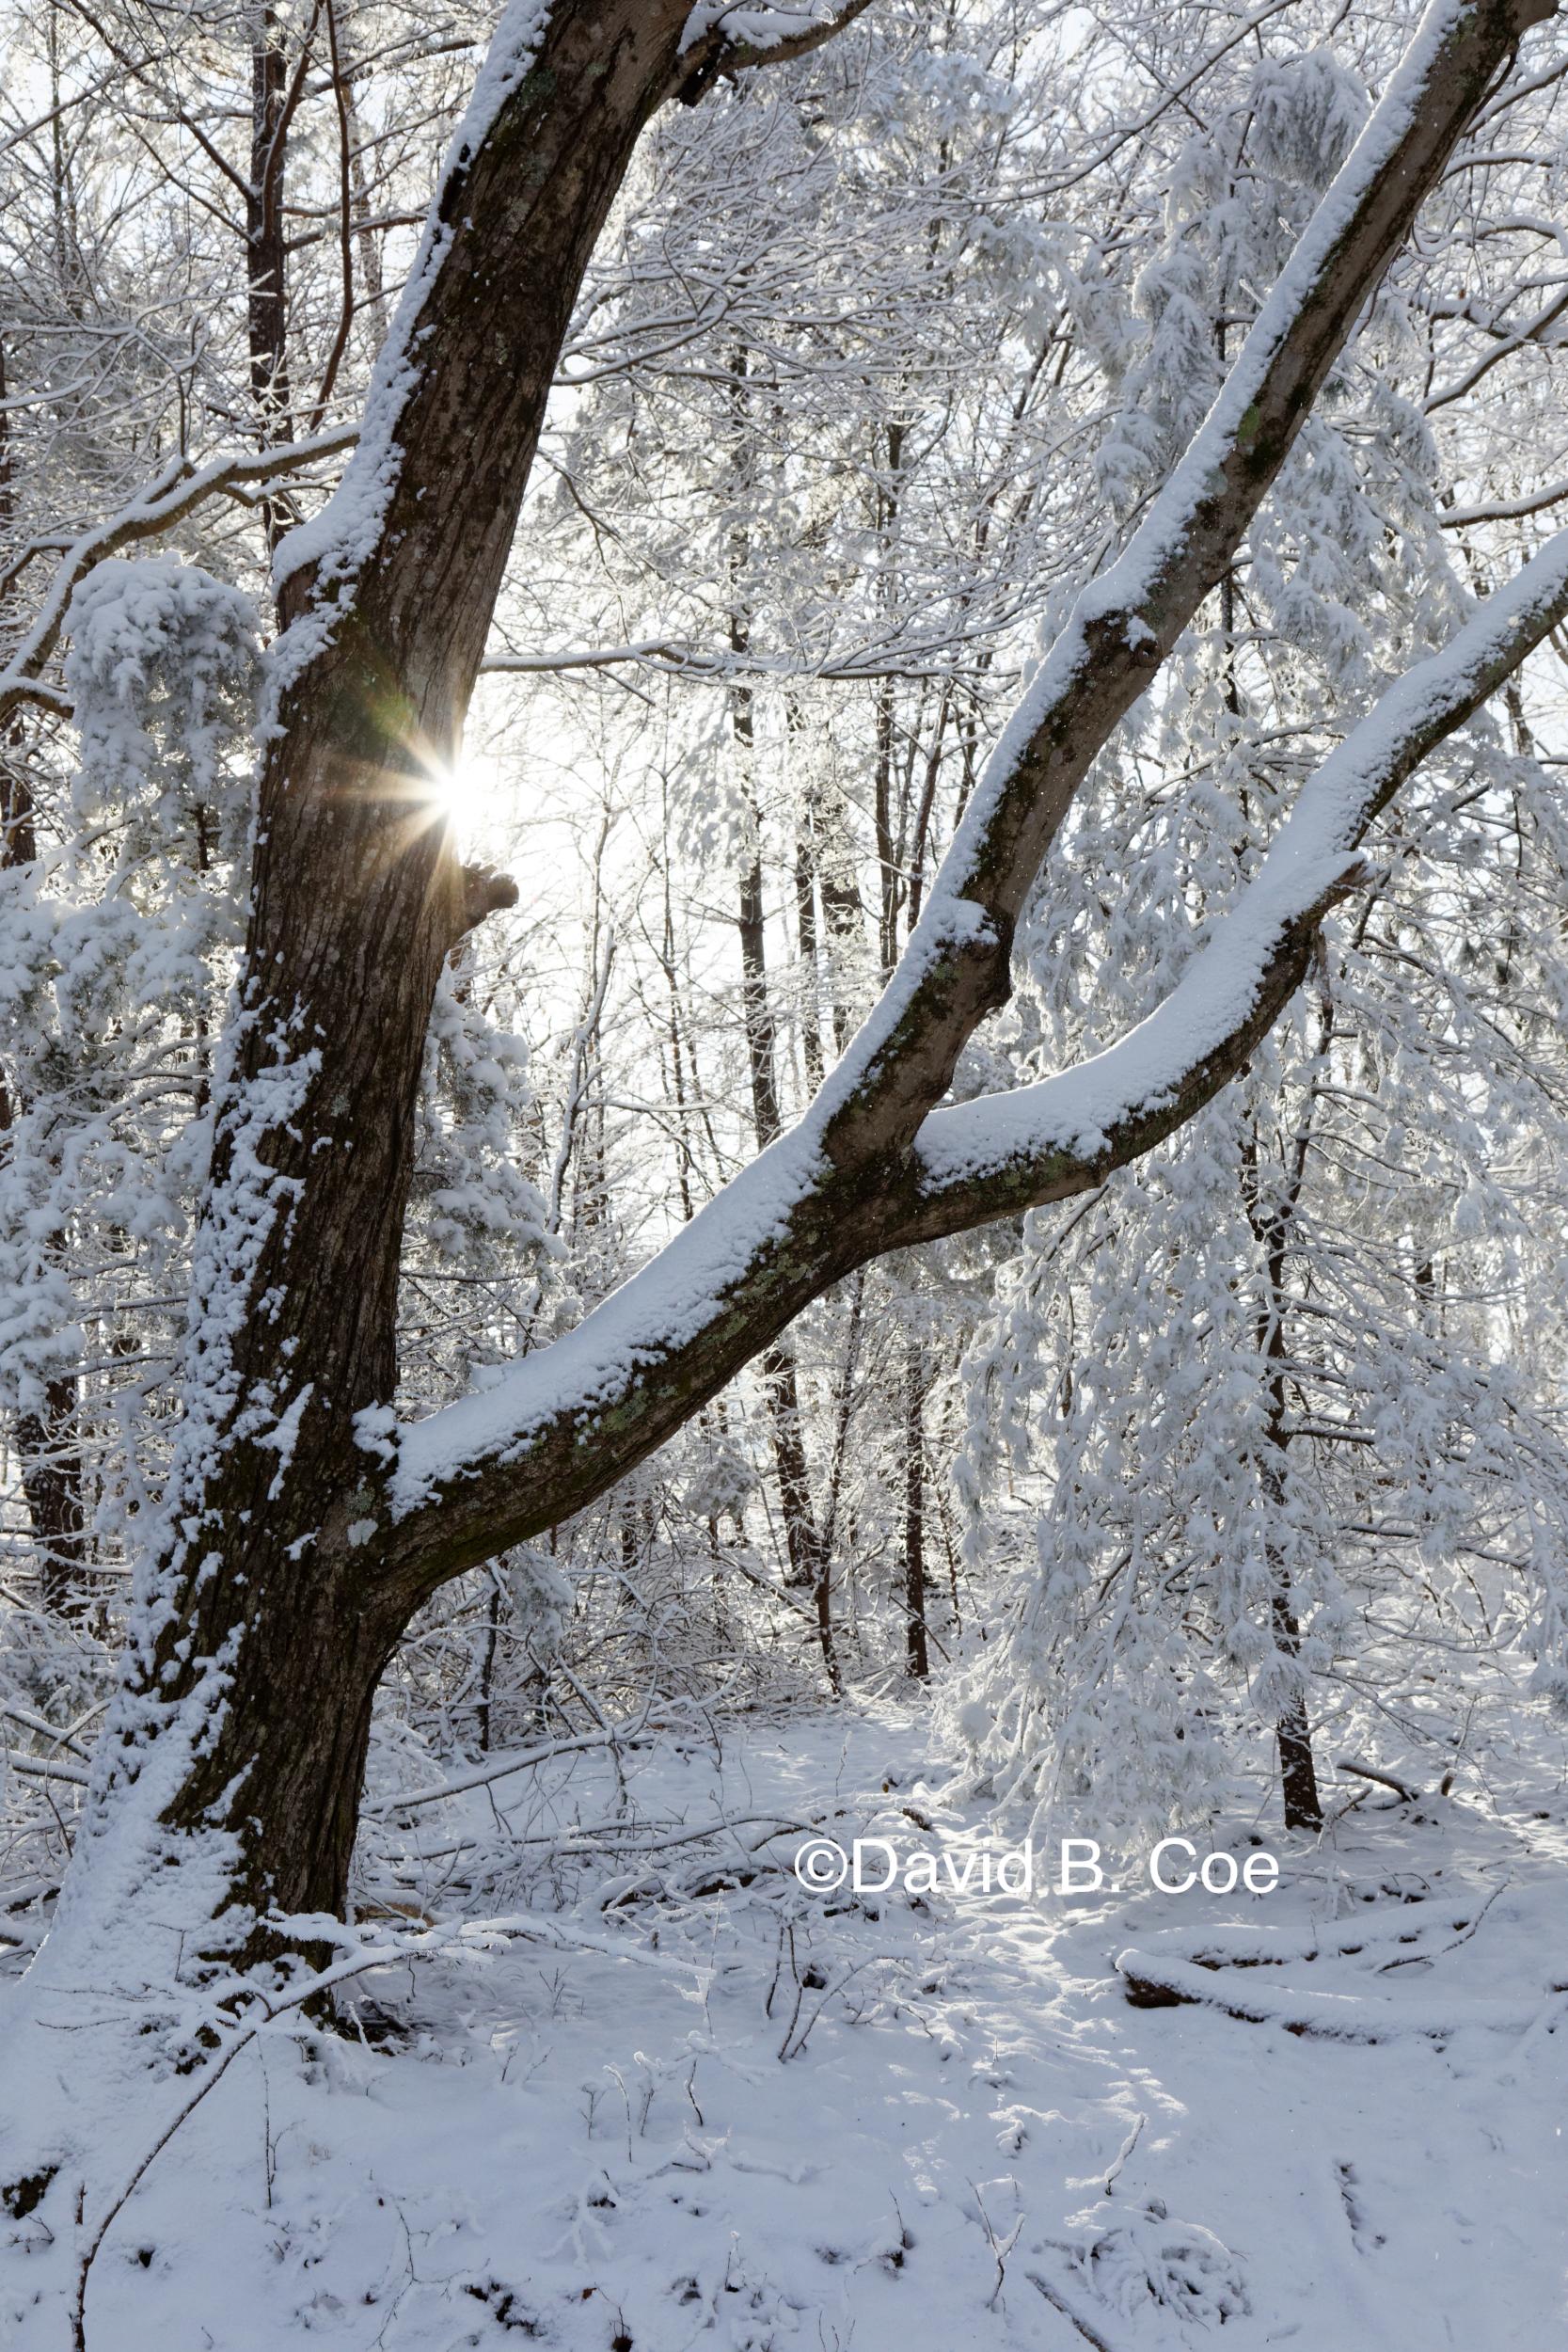 Snow and Morning Sun, by David B. Coe